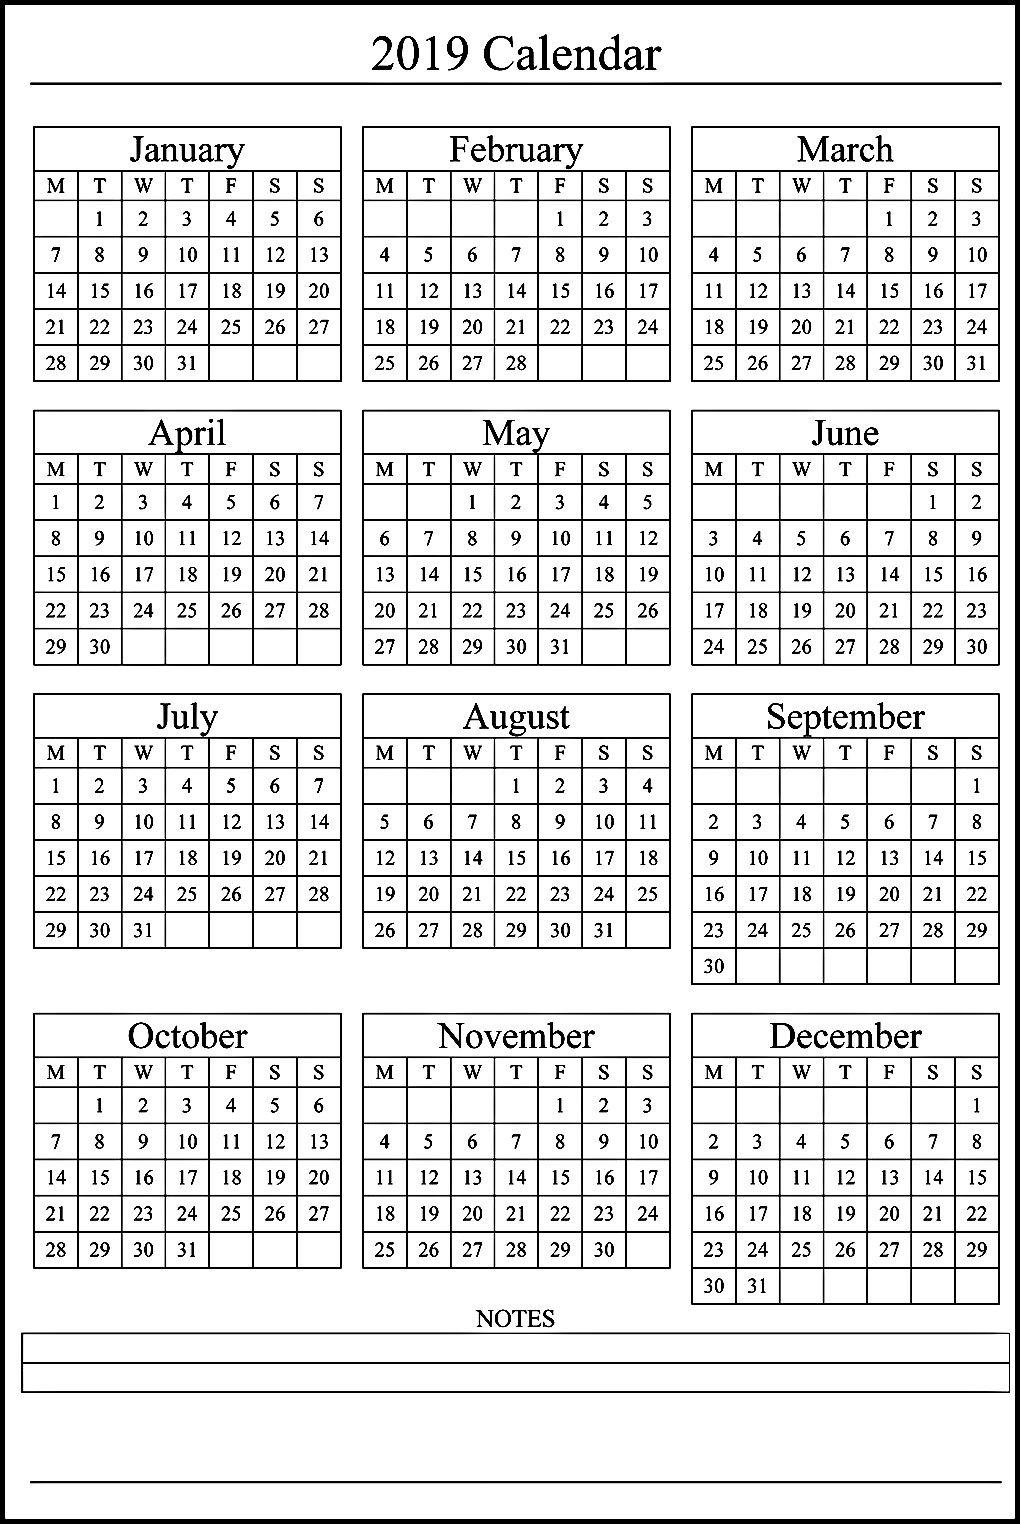 12 Month Calendar On One Page #2019Calendar #holidayscalendar throughout 12 Month Calendar On One Page Template